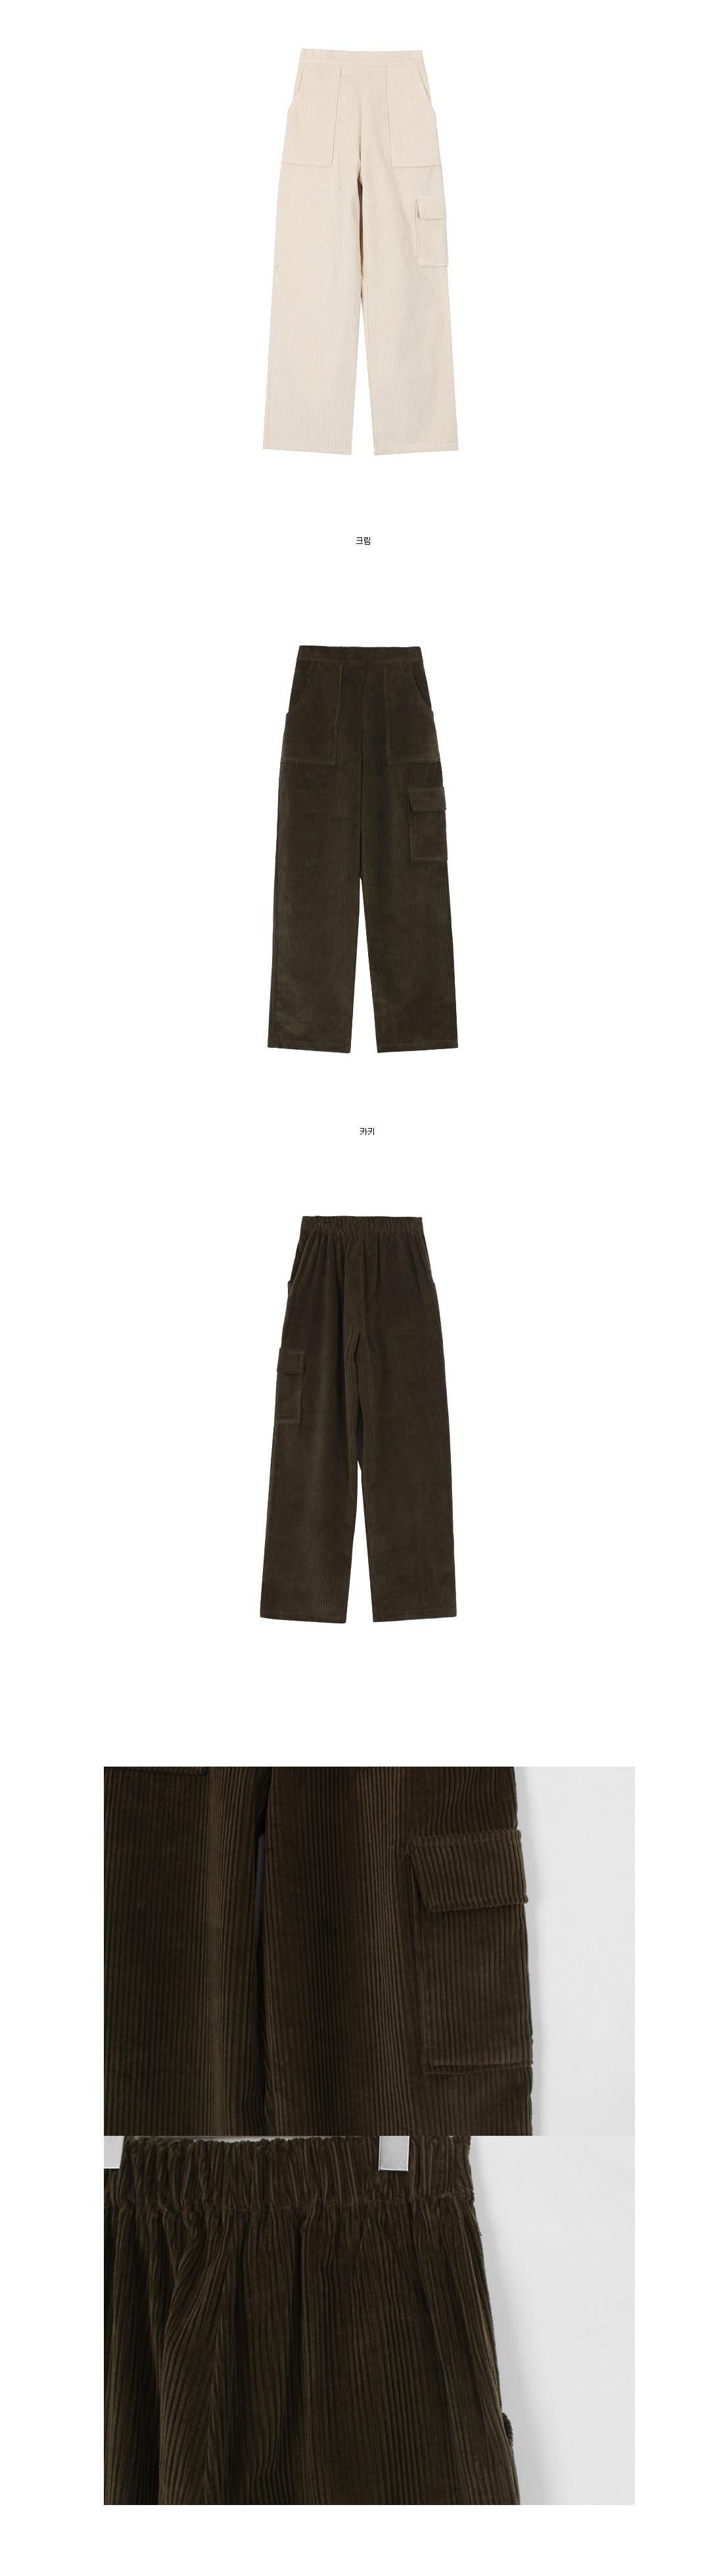 Pocket corduroy pants